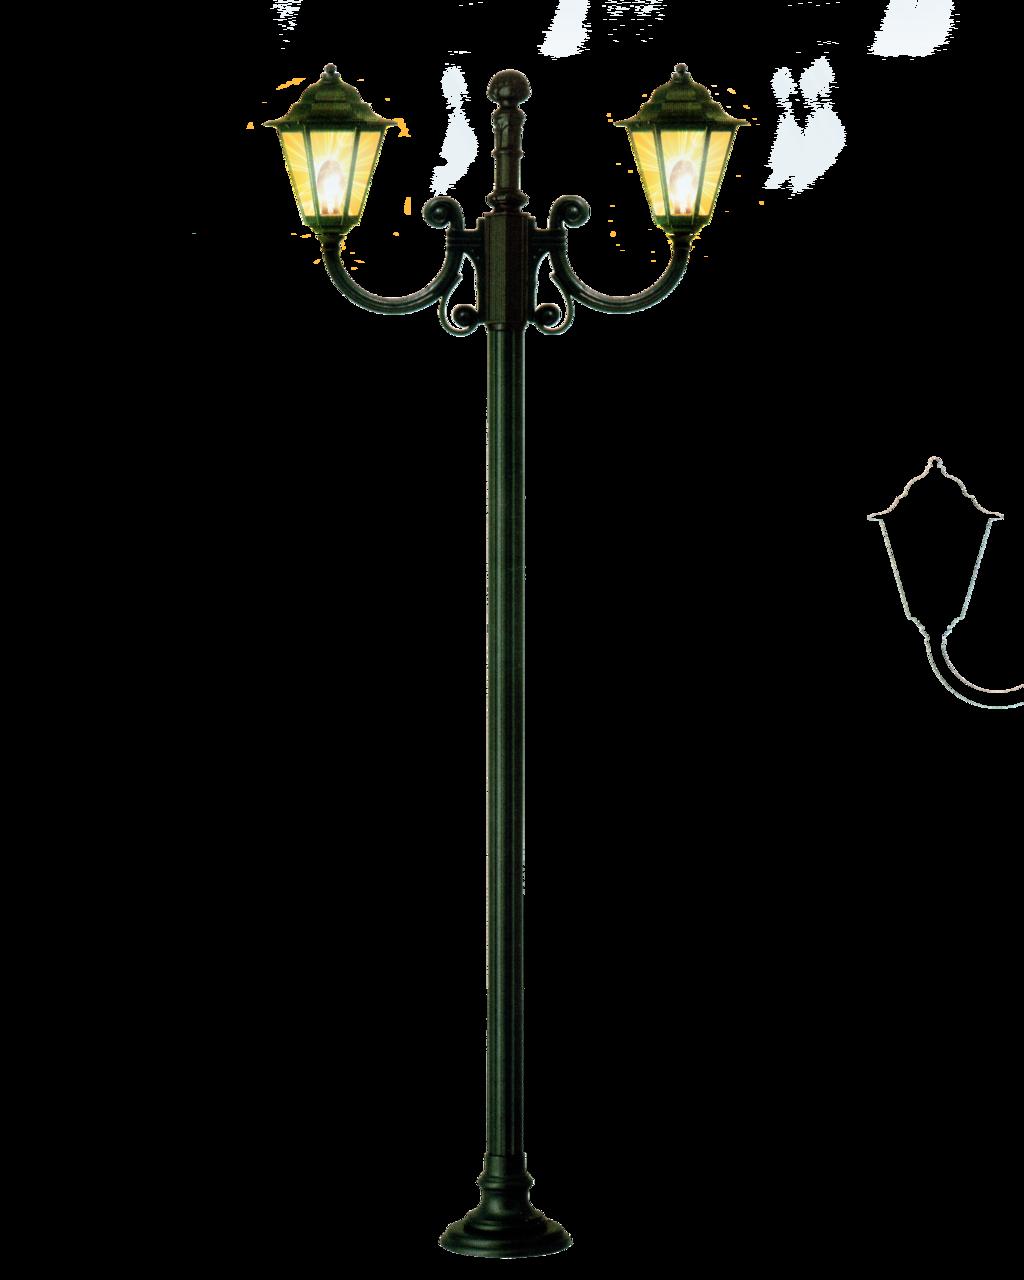 Light Pole Terminology: Clipart Panda - Free Clipart Images